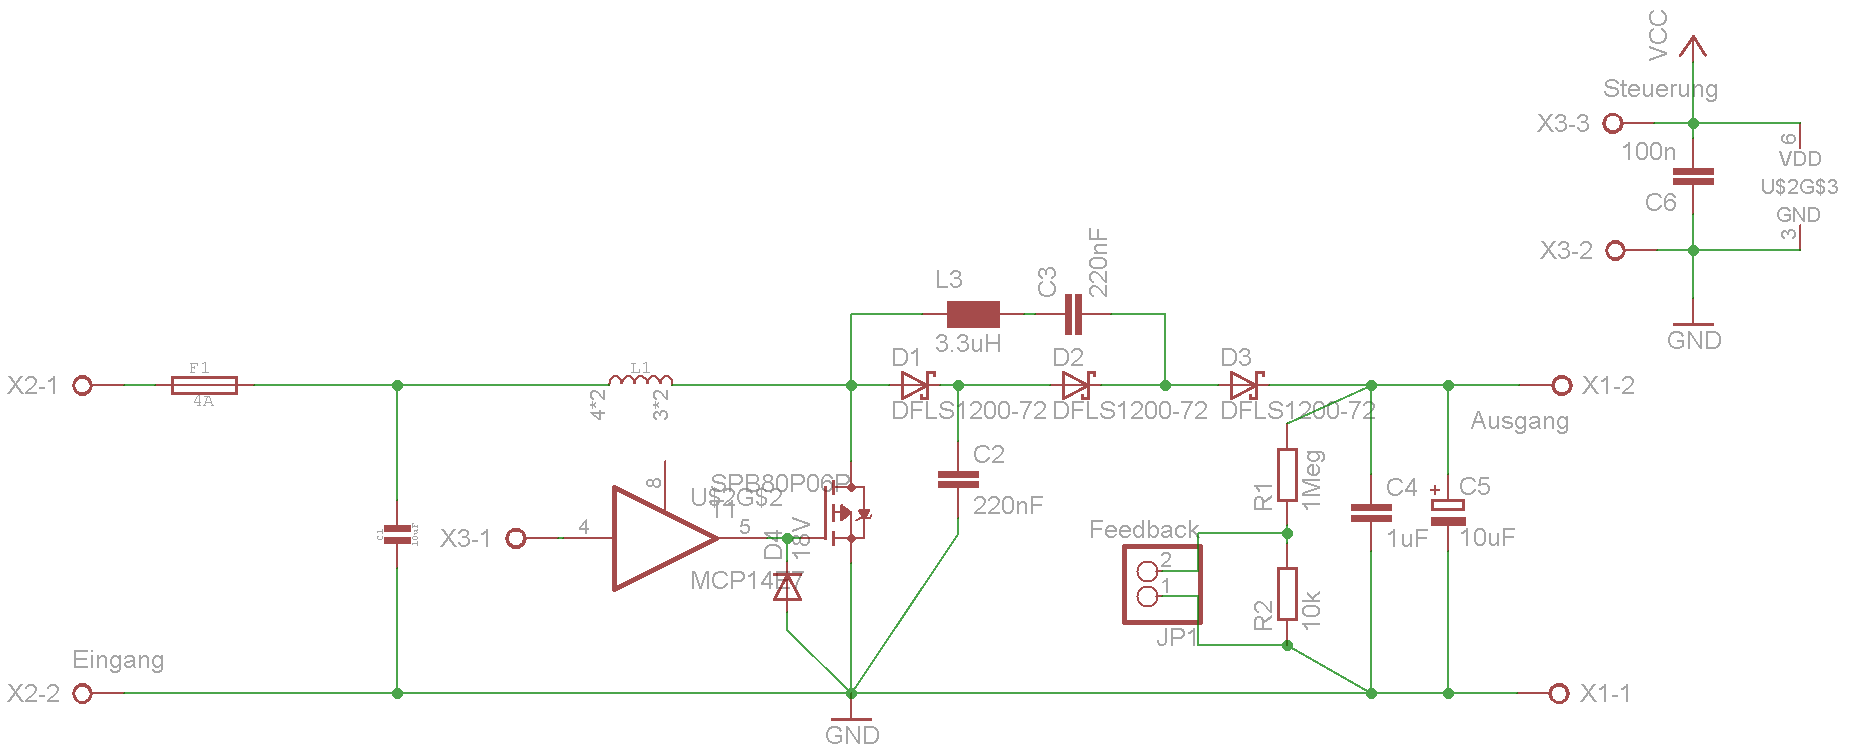 Hochsetzsteller Wirkungsgradprobleme - Mikrocontroller.net